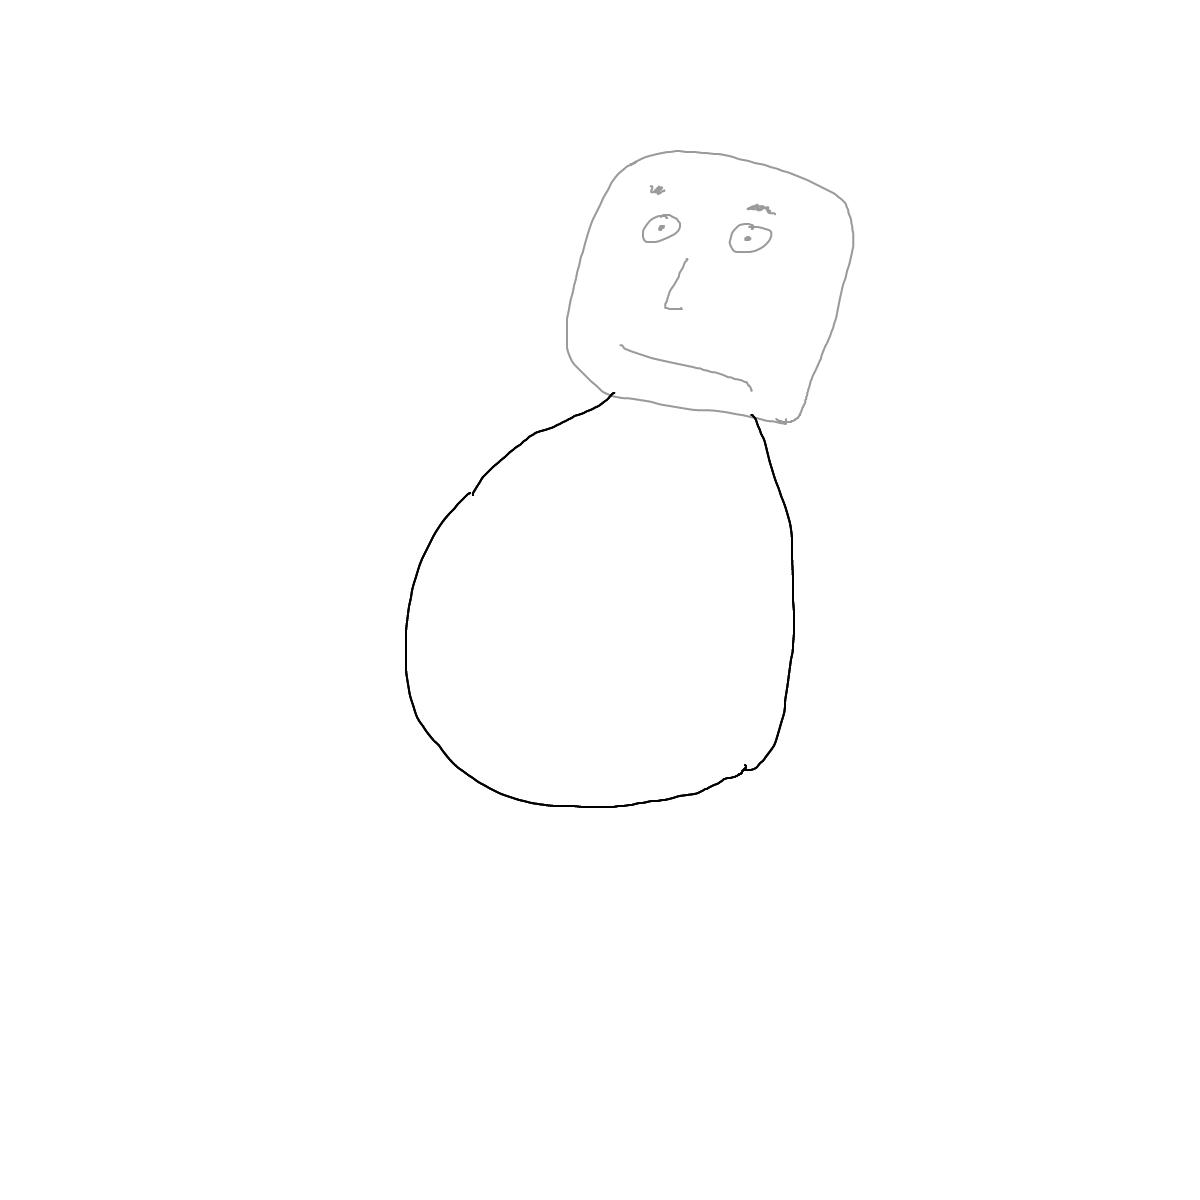 BAAAM drawing#49 lat:52.4751243591308600lng: 13.4067316055297850